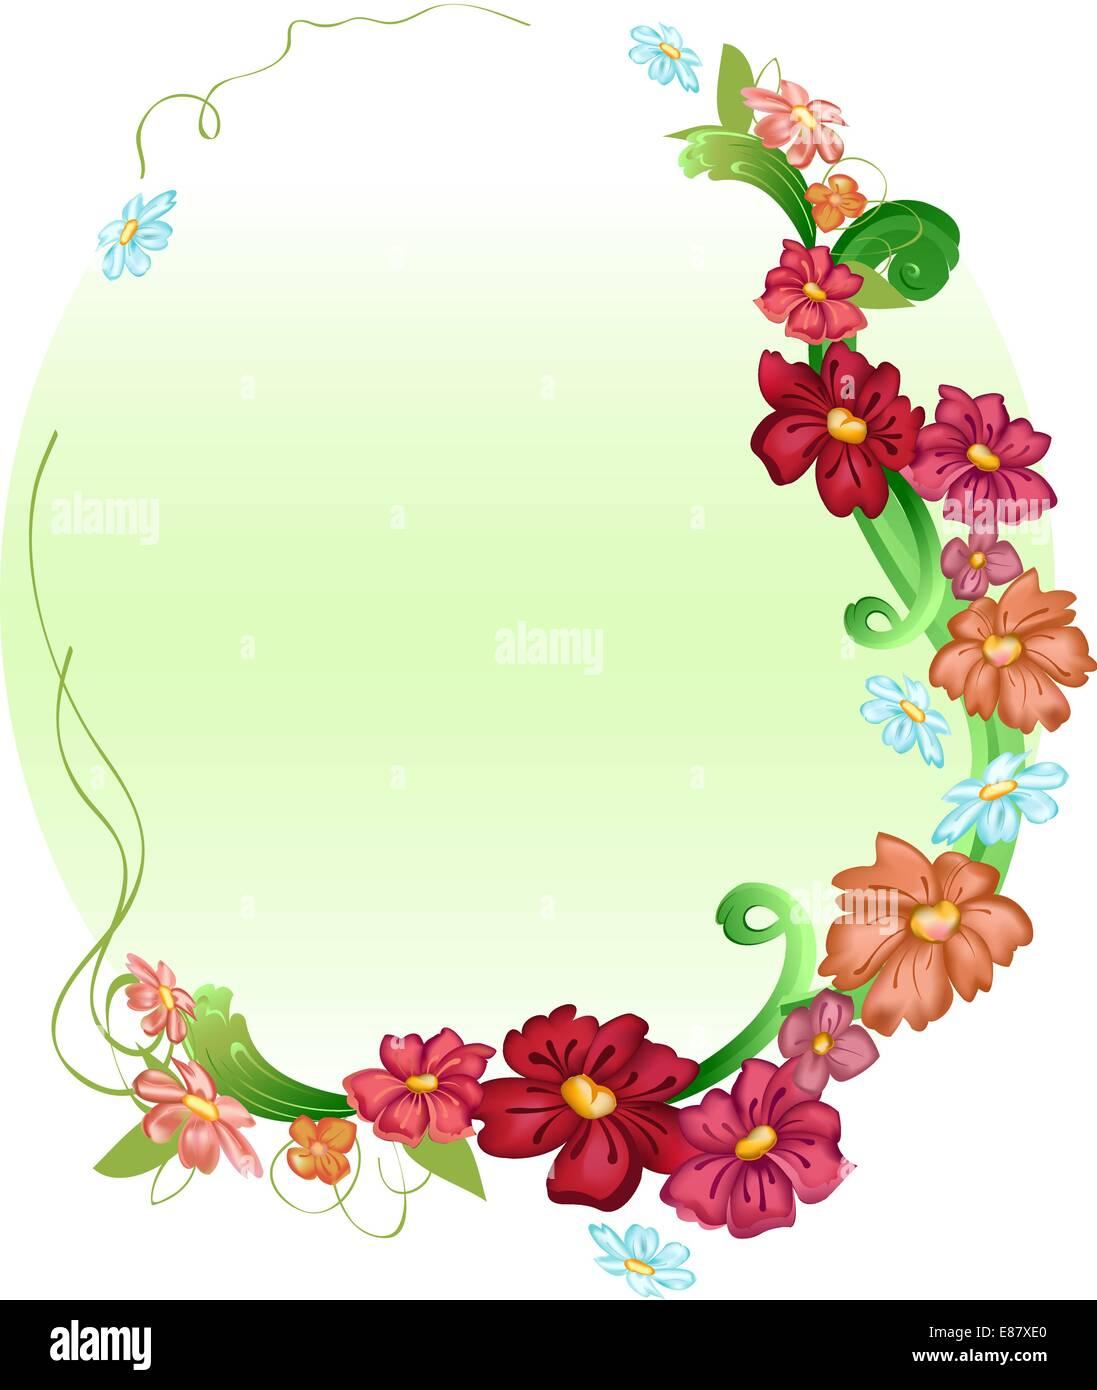 Vector illustraition of elegant floral frames Stock Vector Art ...